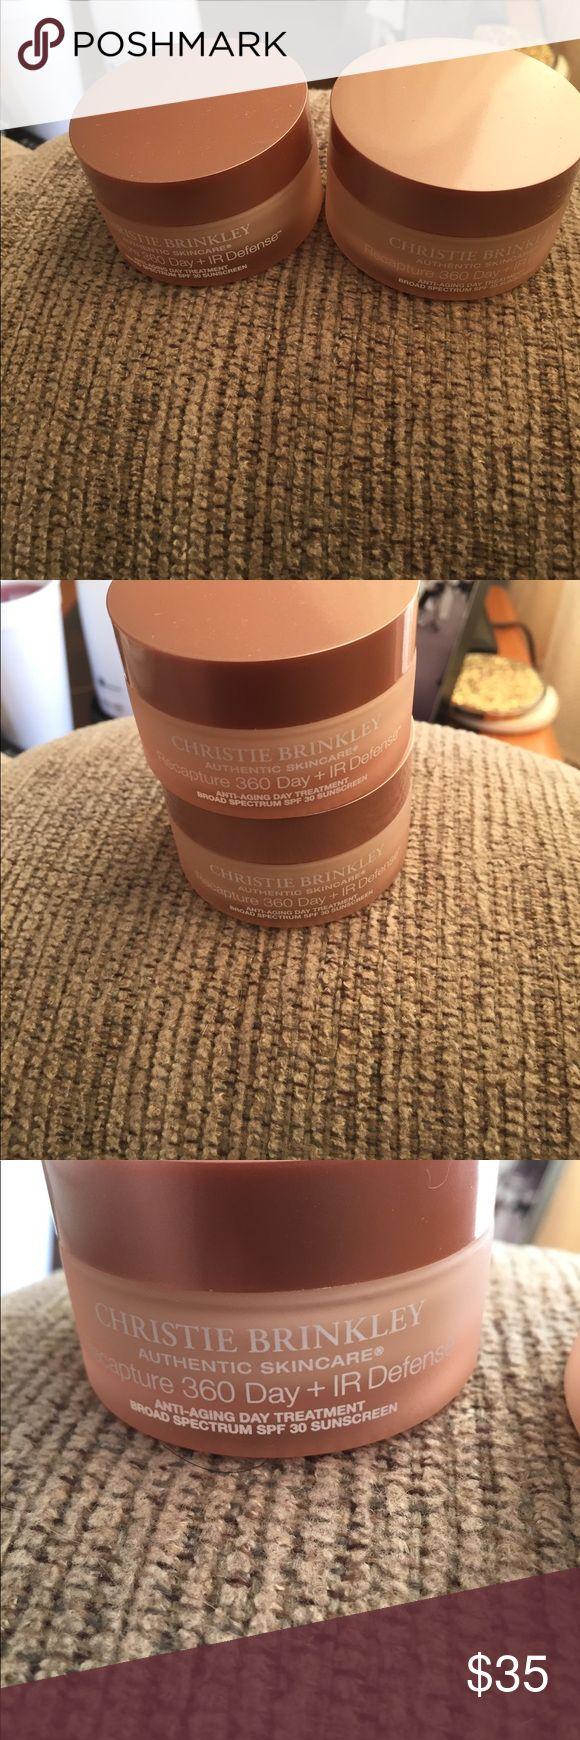 Christie Brinkley Authentic Skincare Christie Brinkley Authentic Skincare. 2 brand new anti-aging day treatment moisturizer christie Brinkley Makeup Face Primer